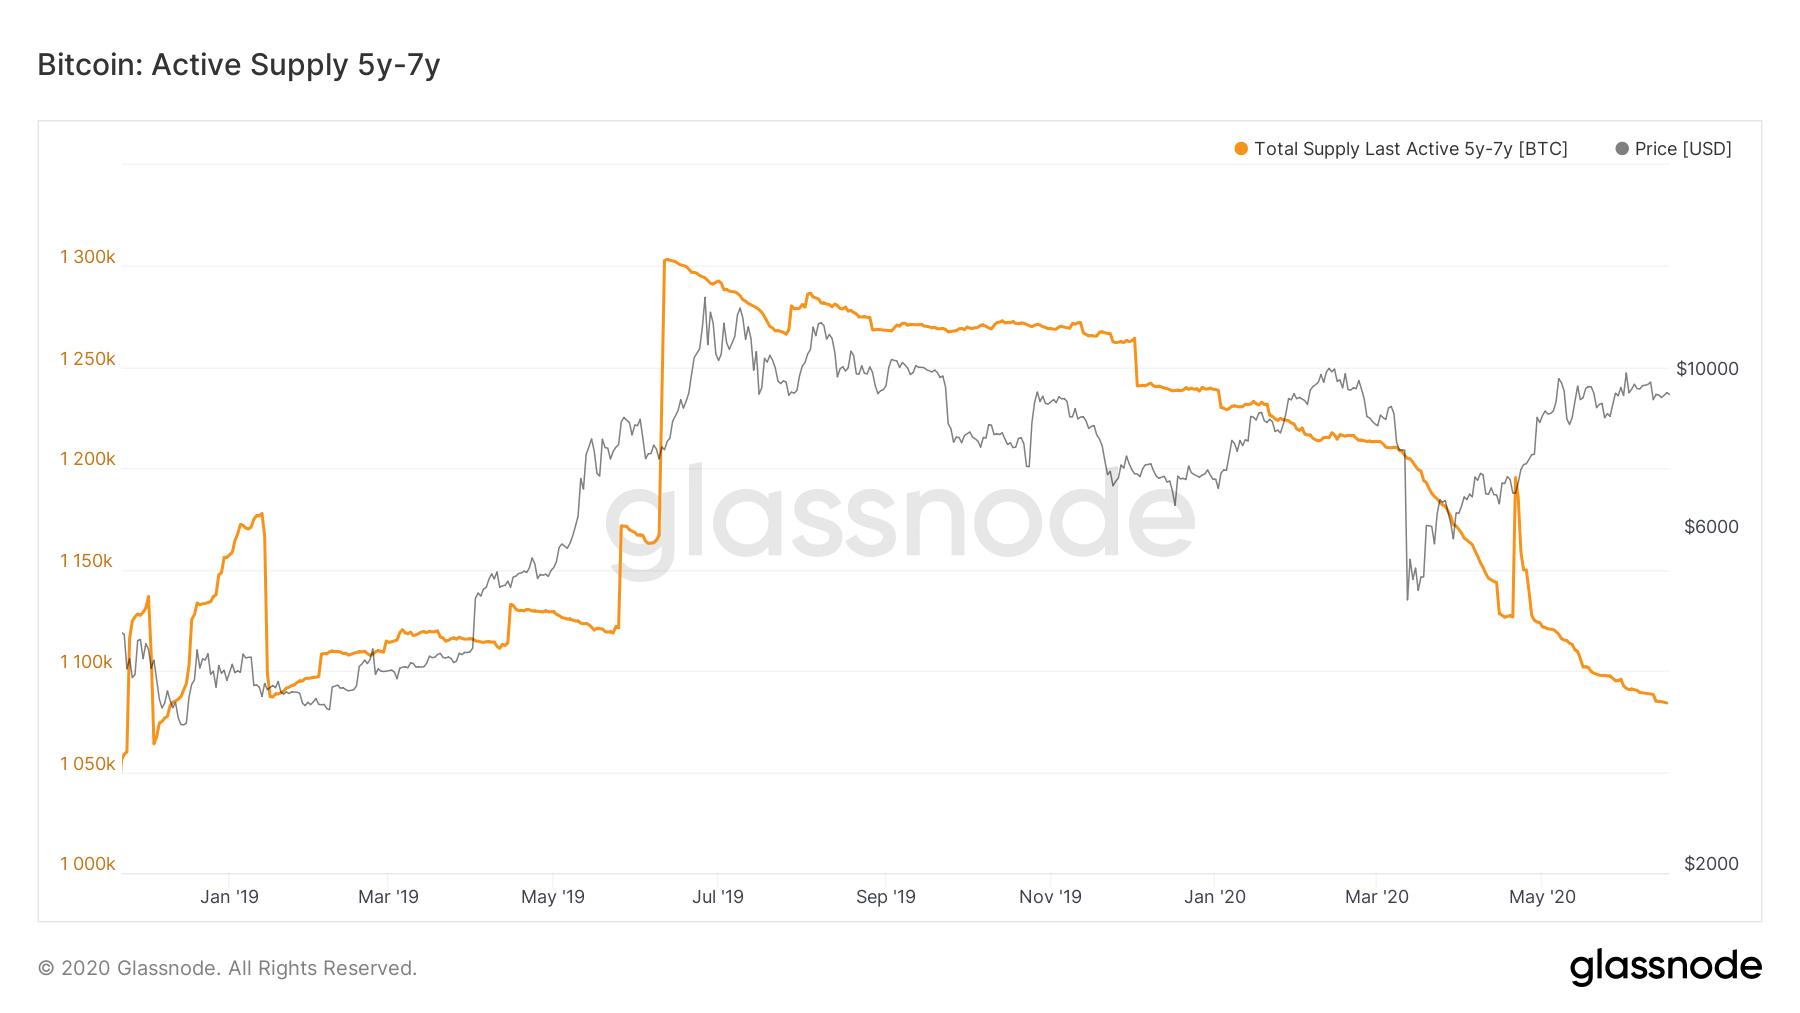 Bitcoin active supply